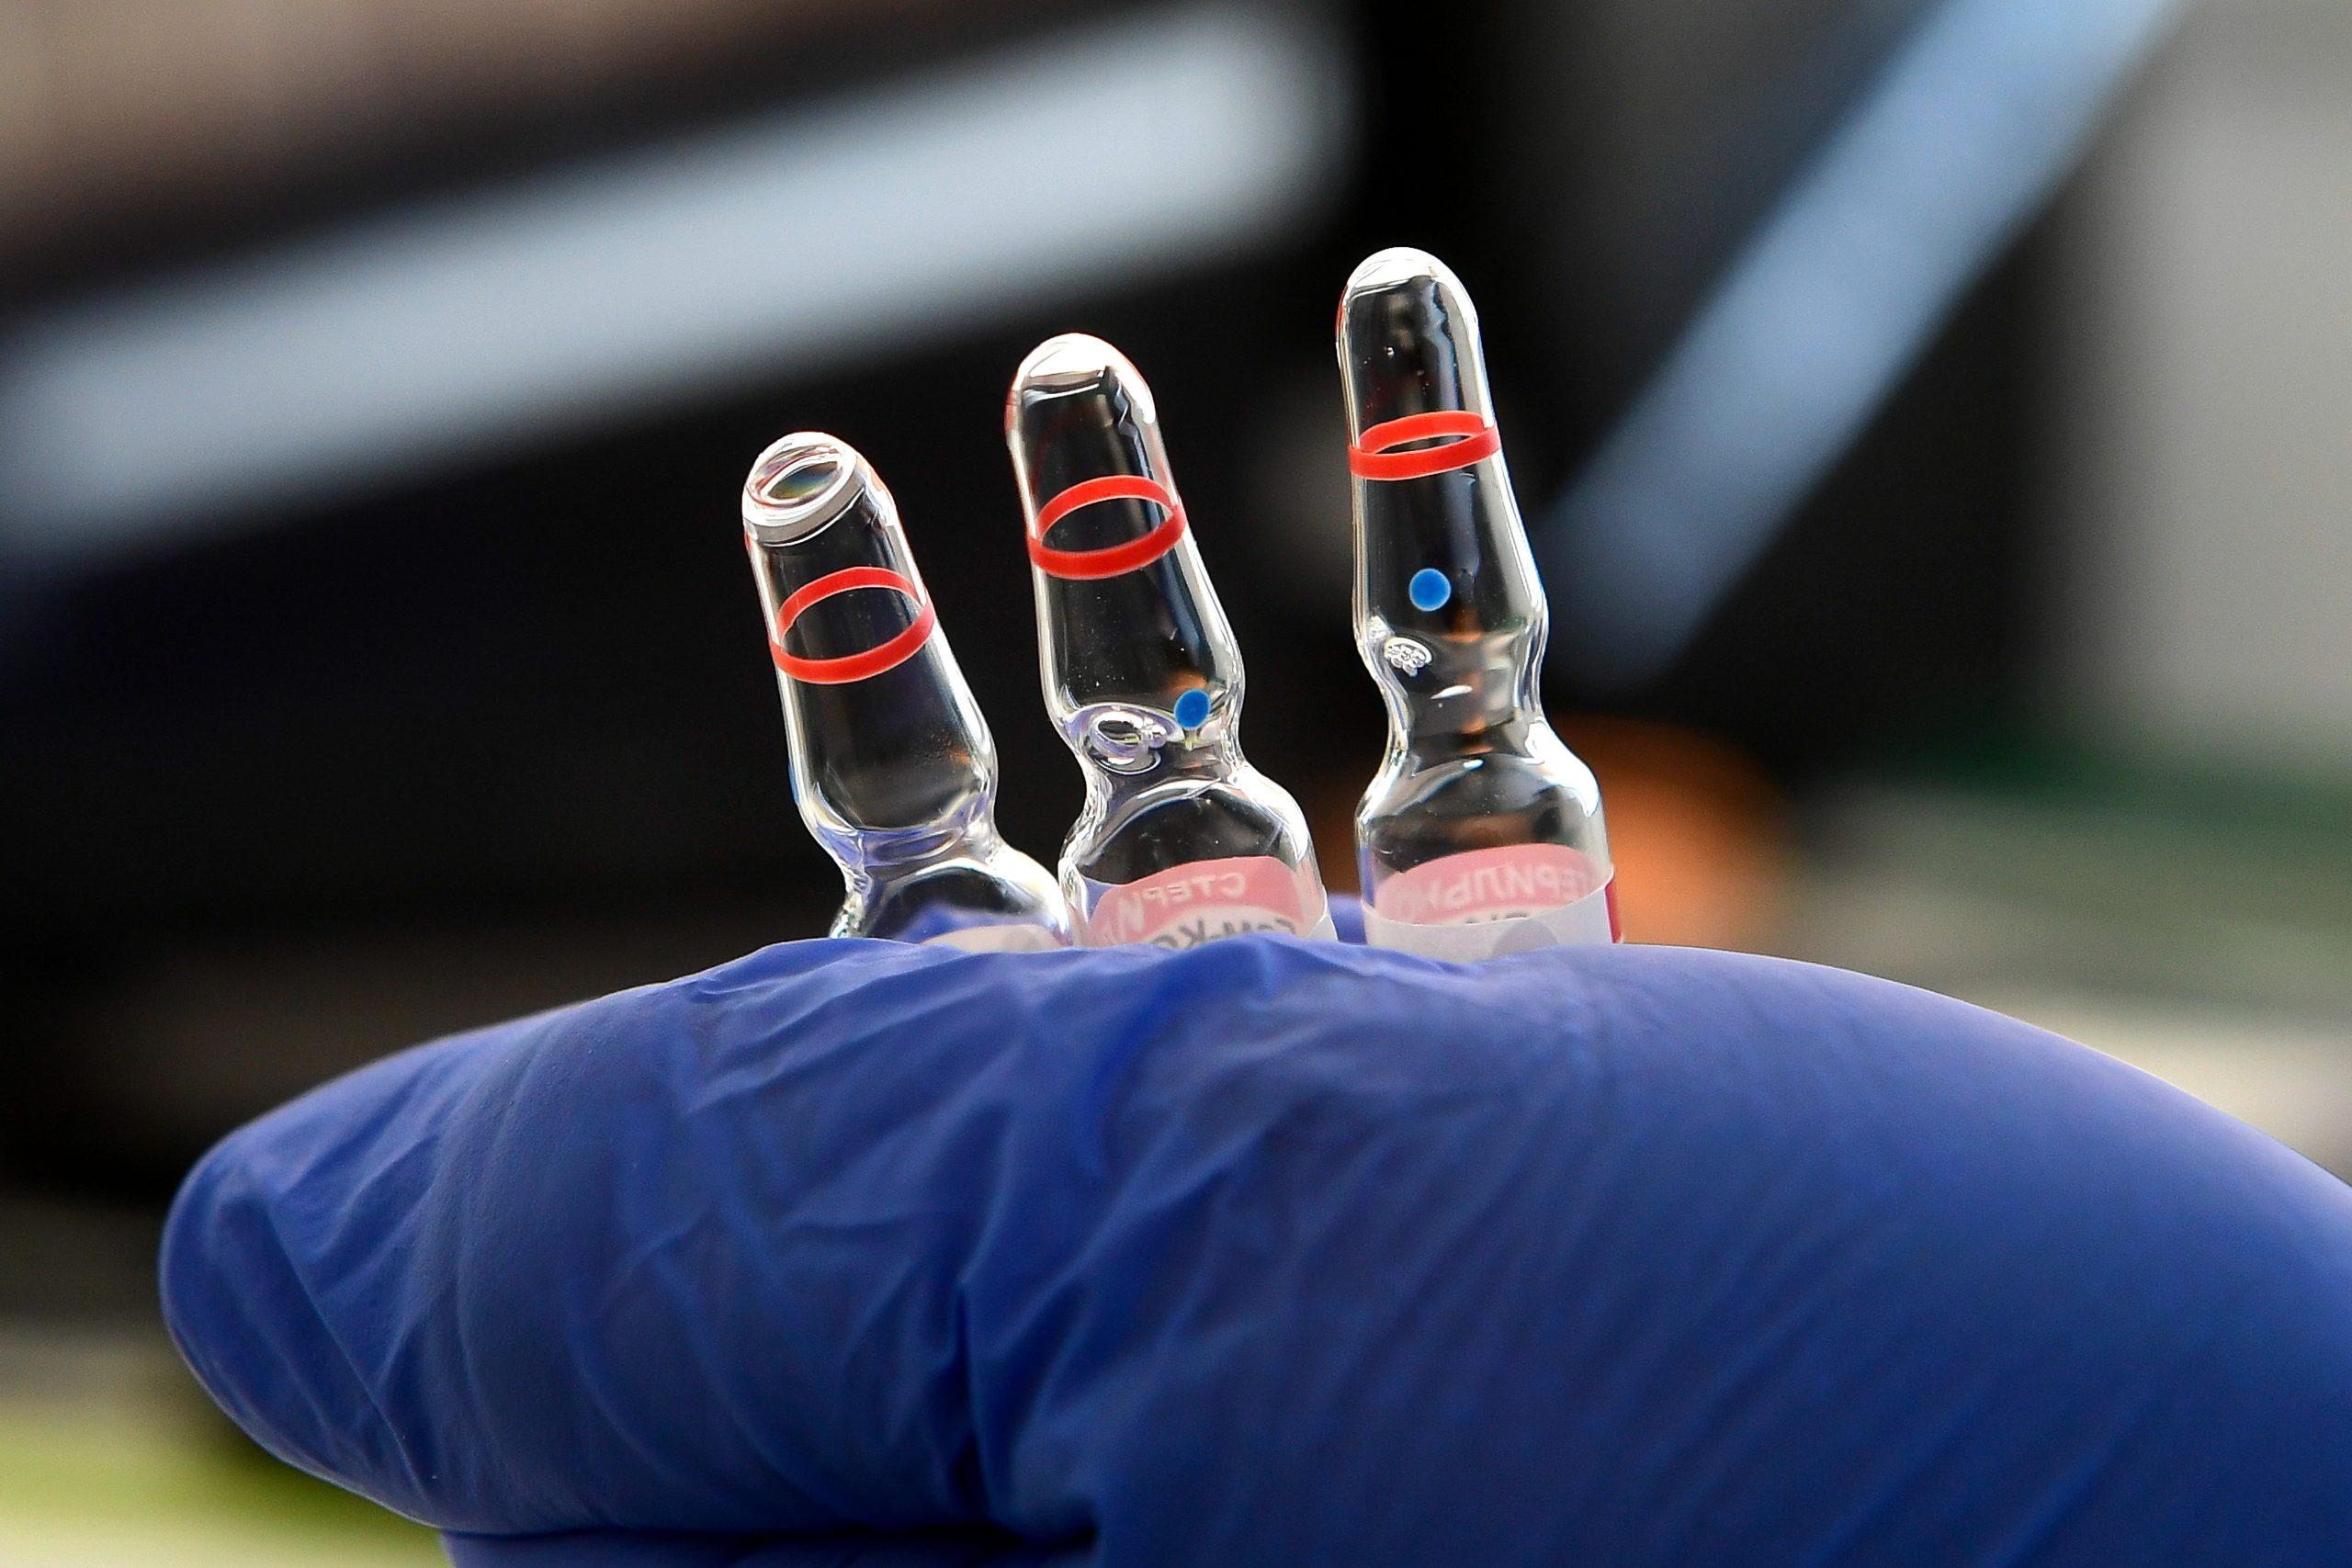 Press Roundup: Row Over Vaccine Efficacy